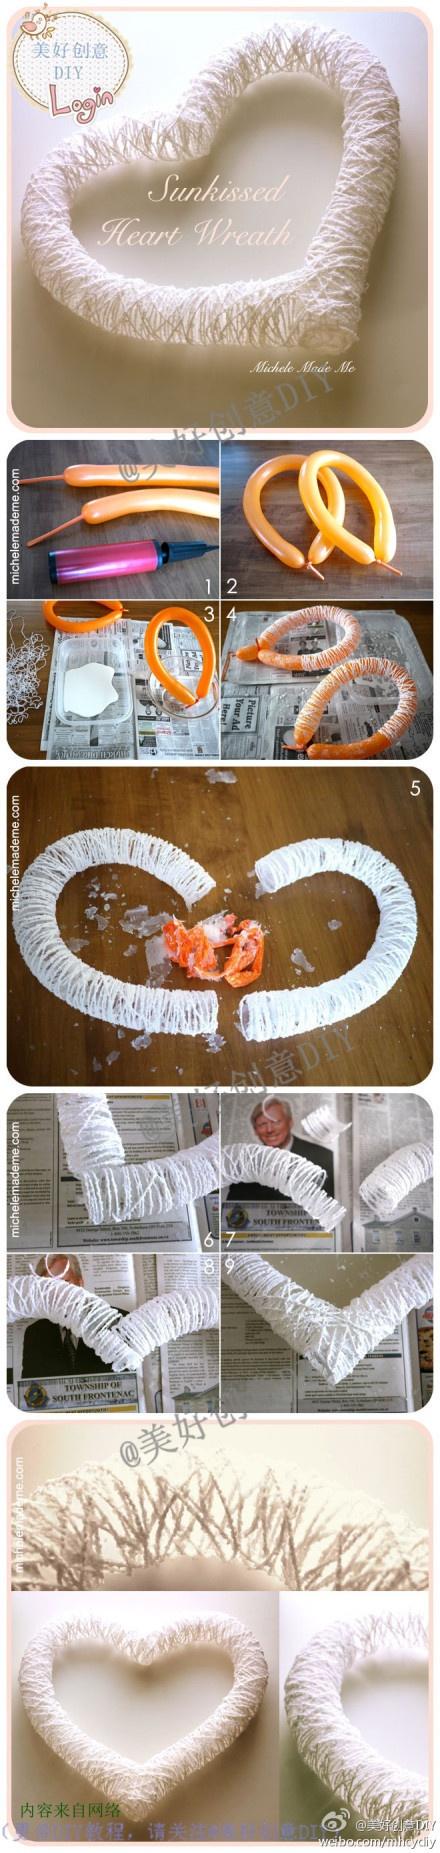 Use balloon animal balloons to make neat string art.